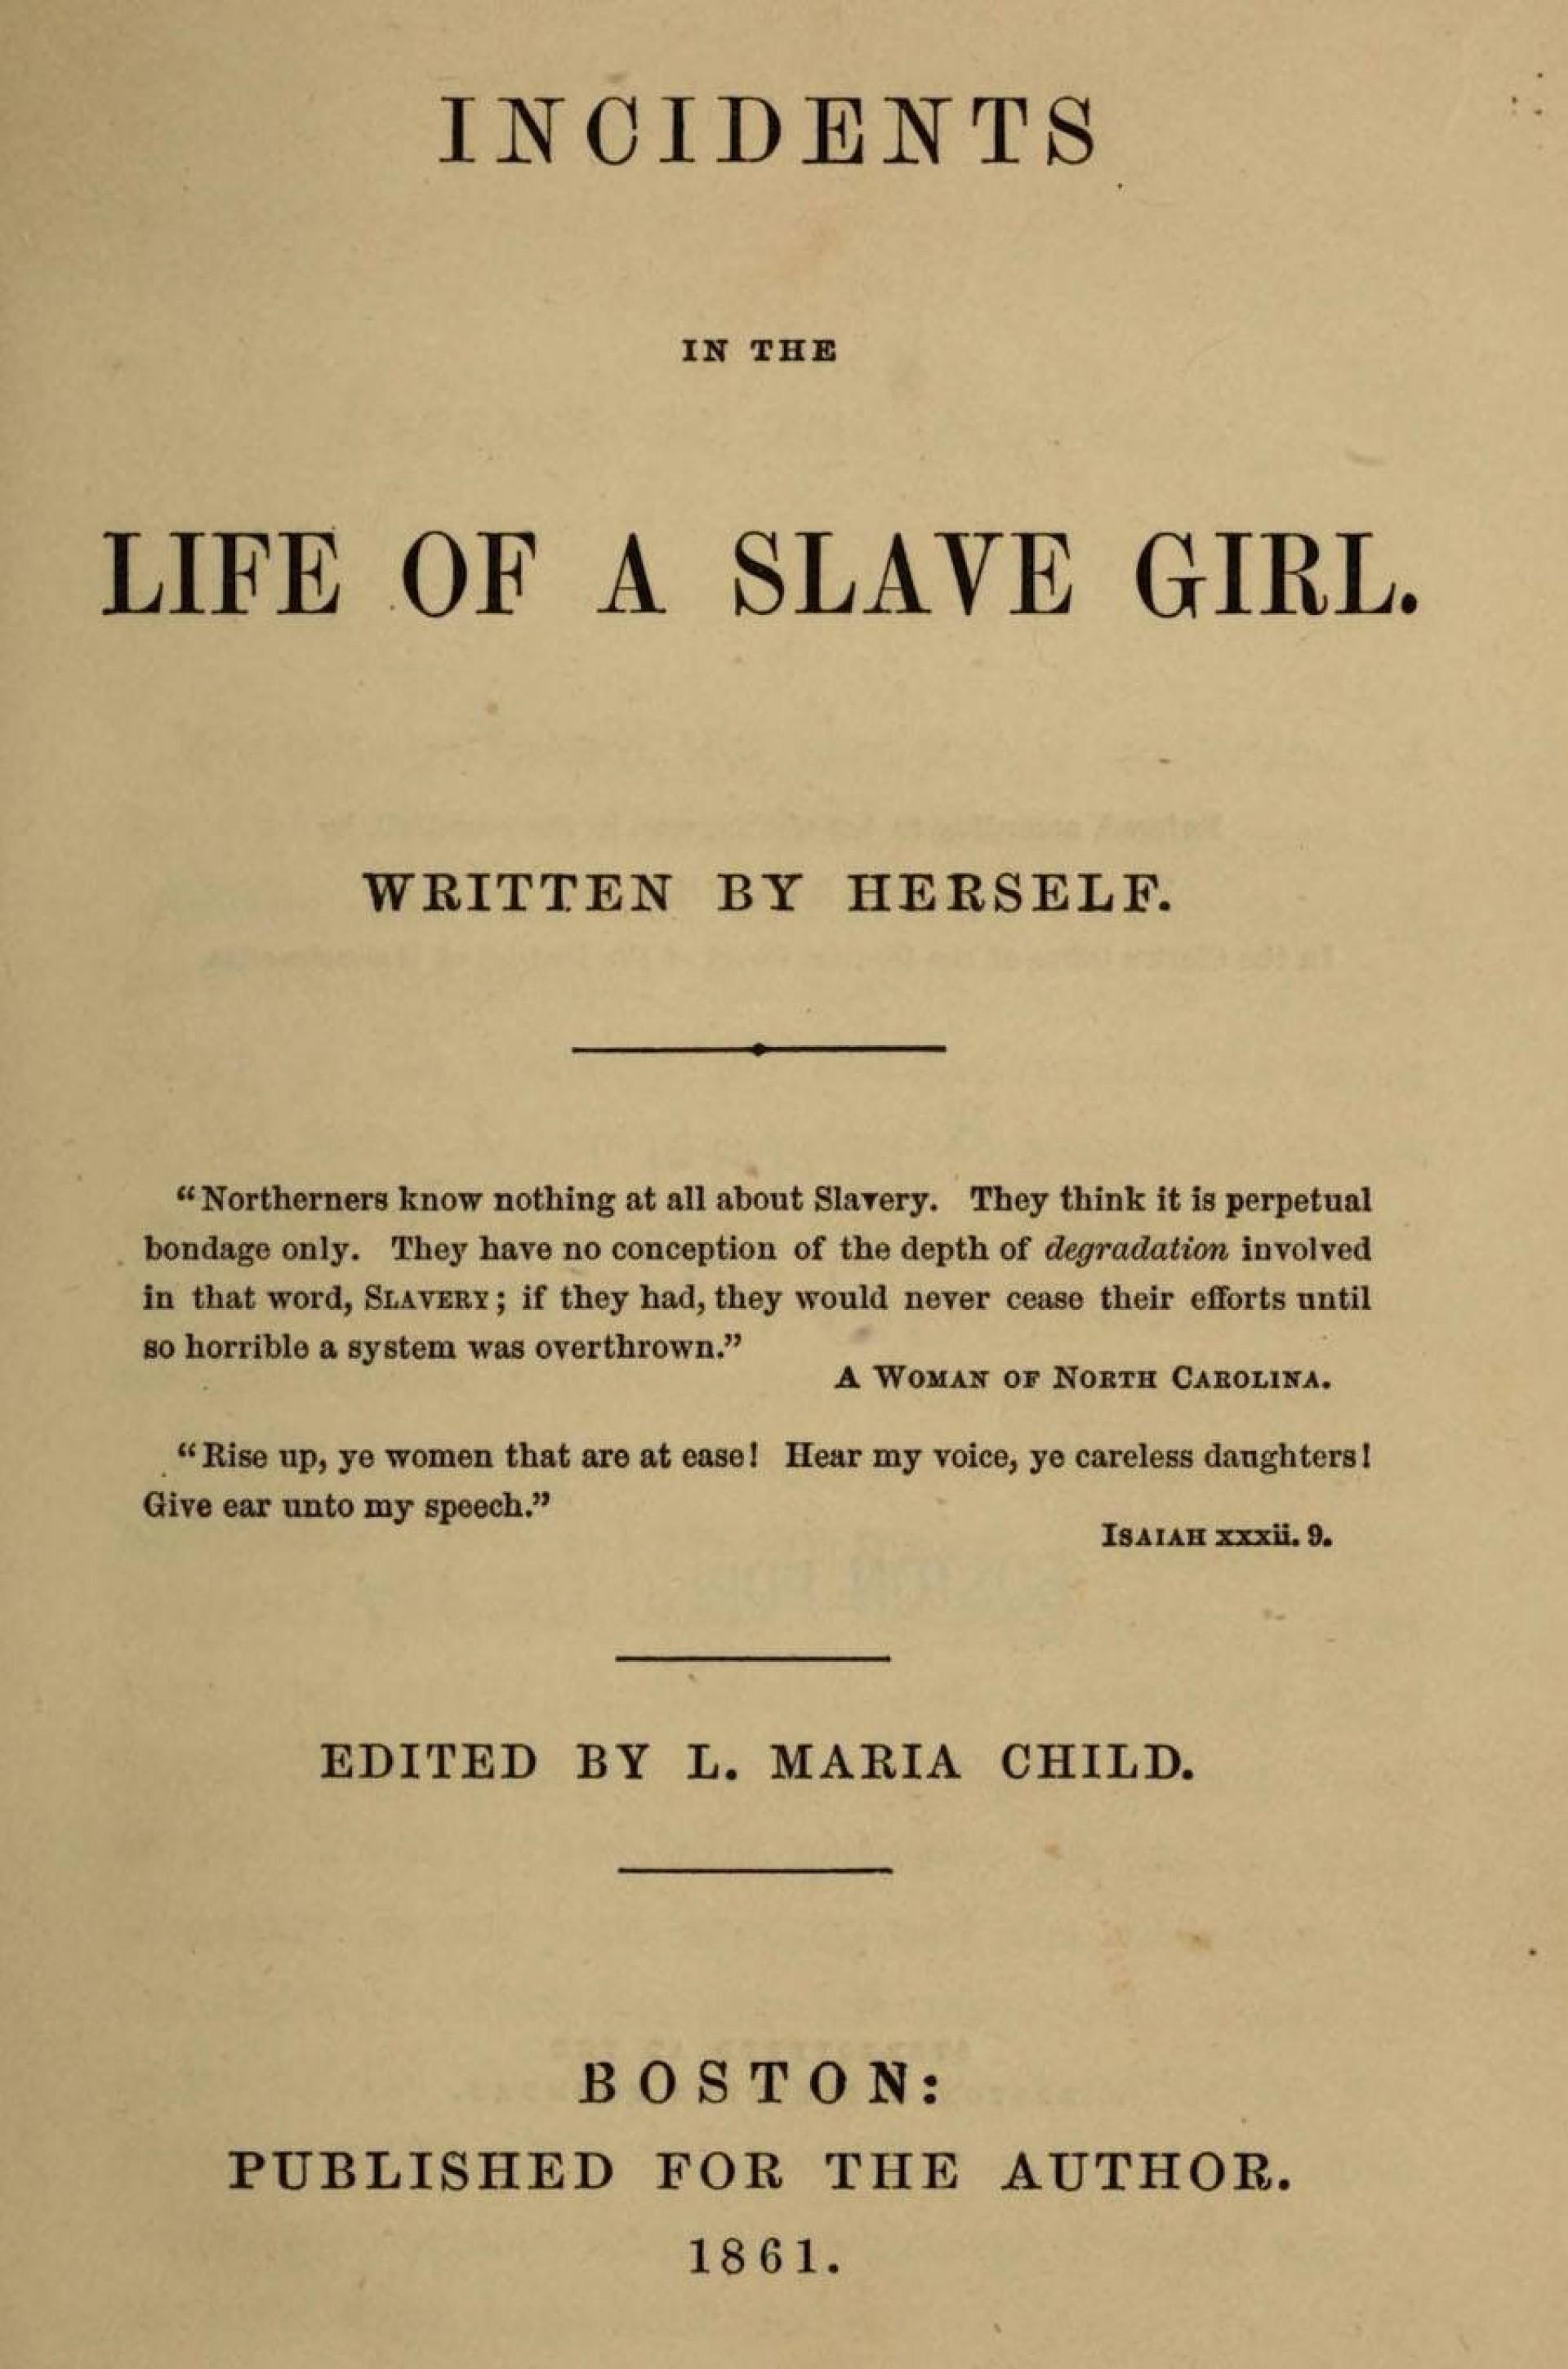 001 Harriet Jacobs Essay Example Black History Remarkable Vs Frederick Douglass Topics Analysis 1920